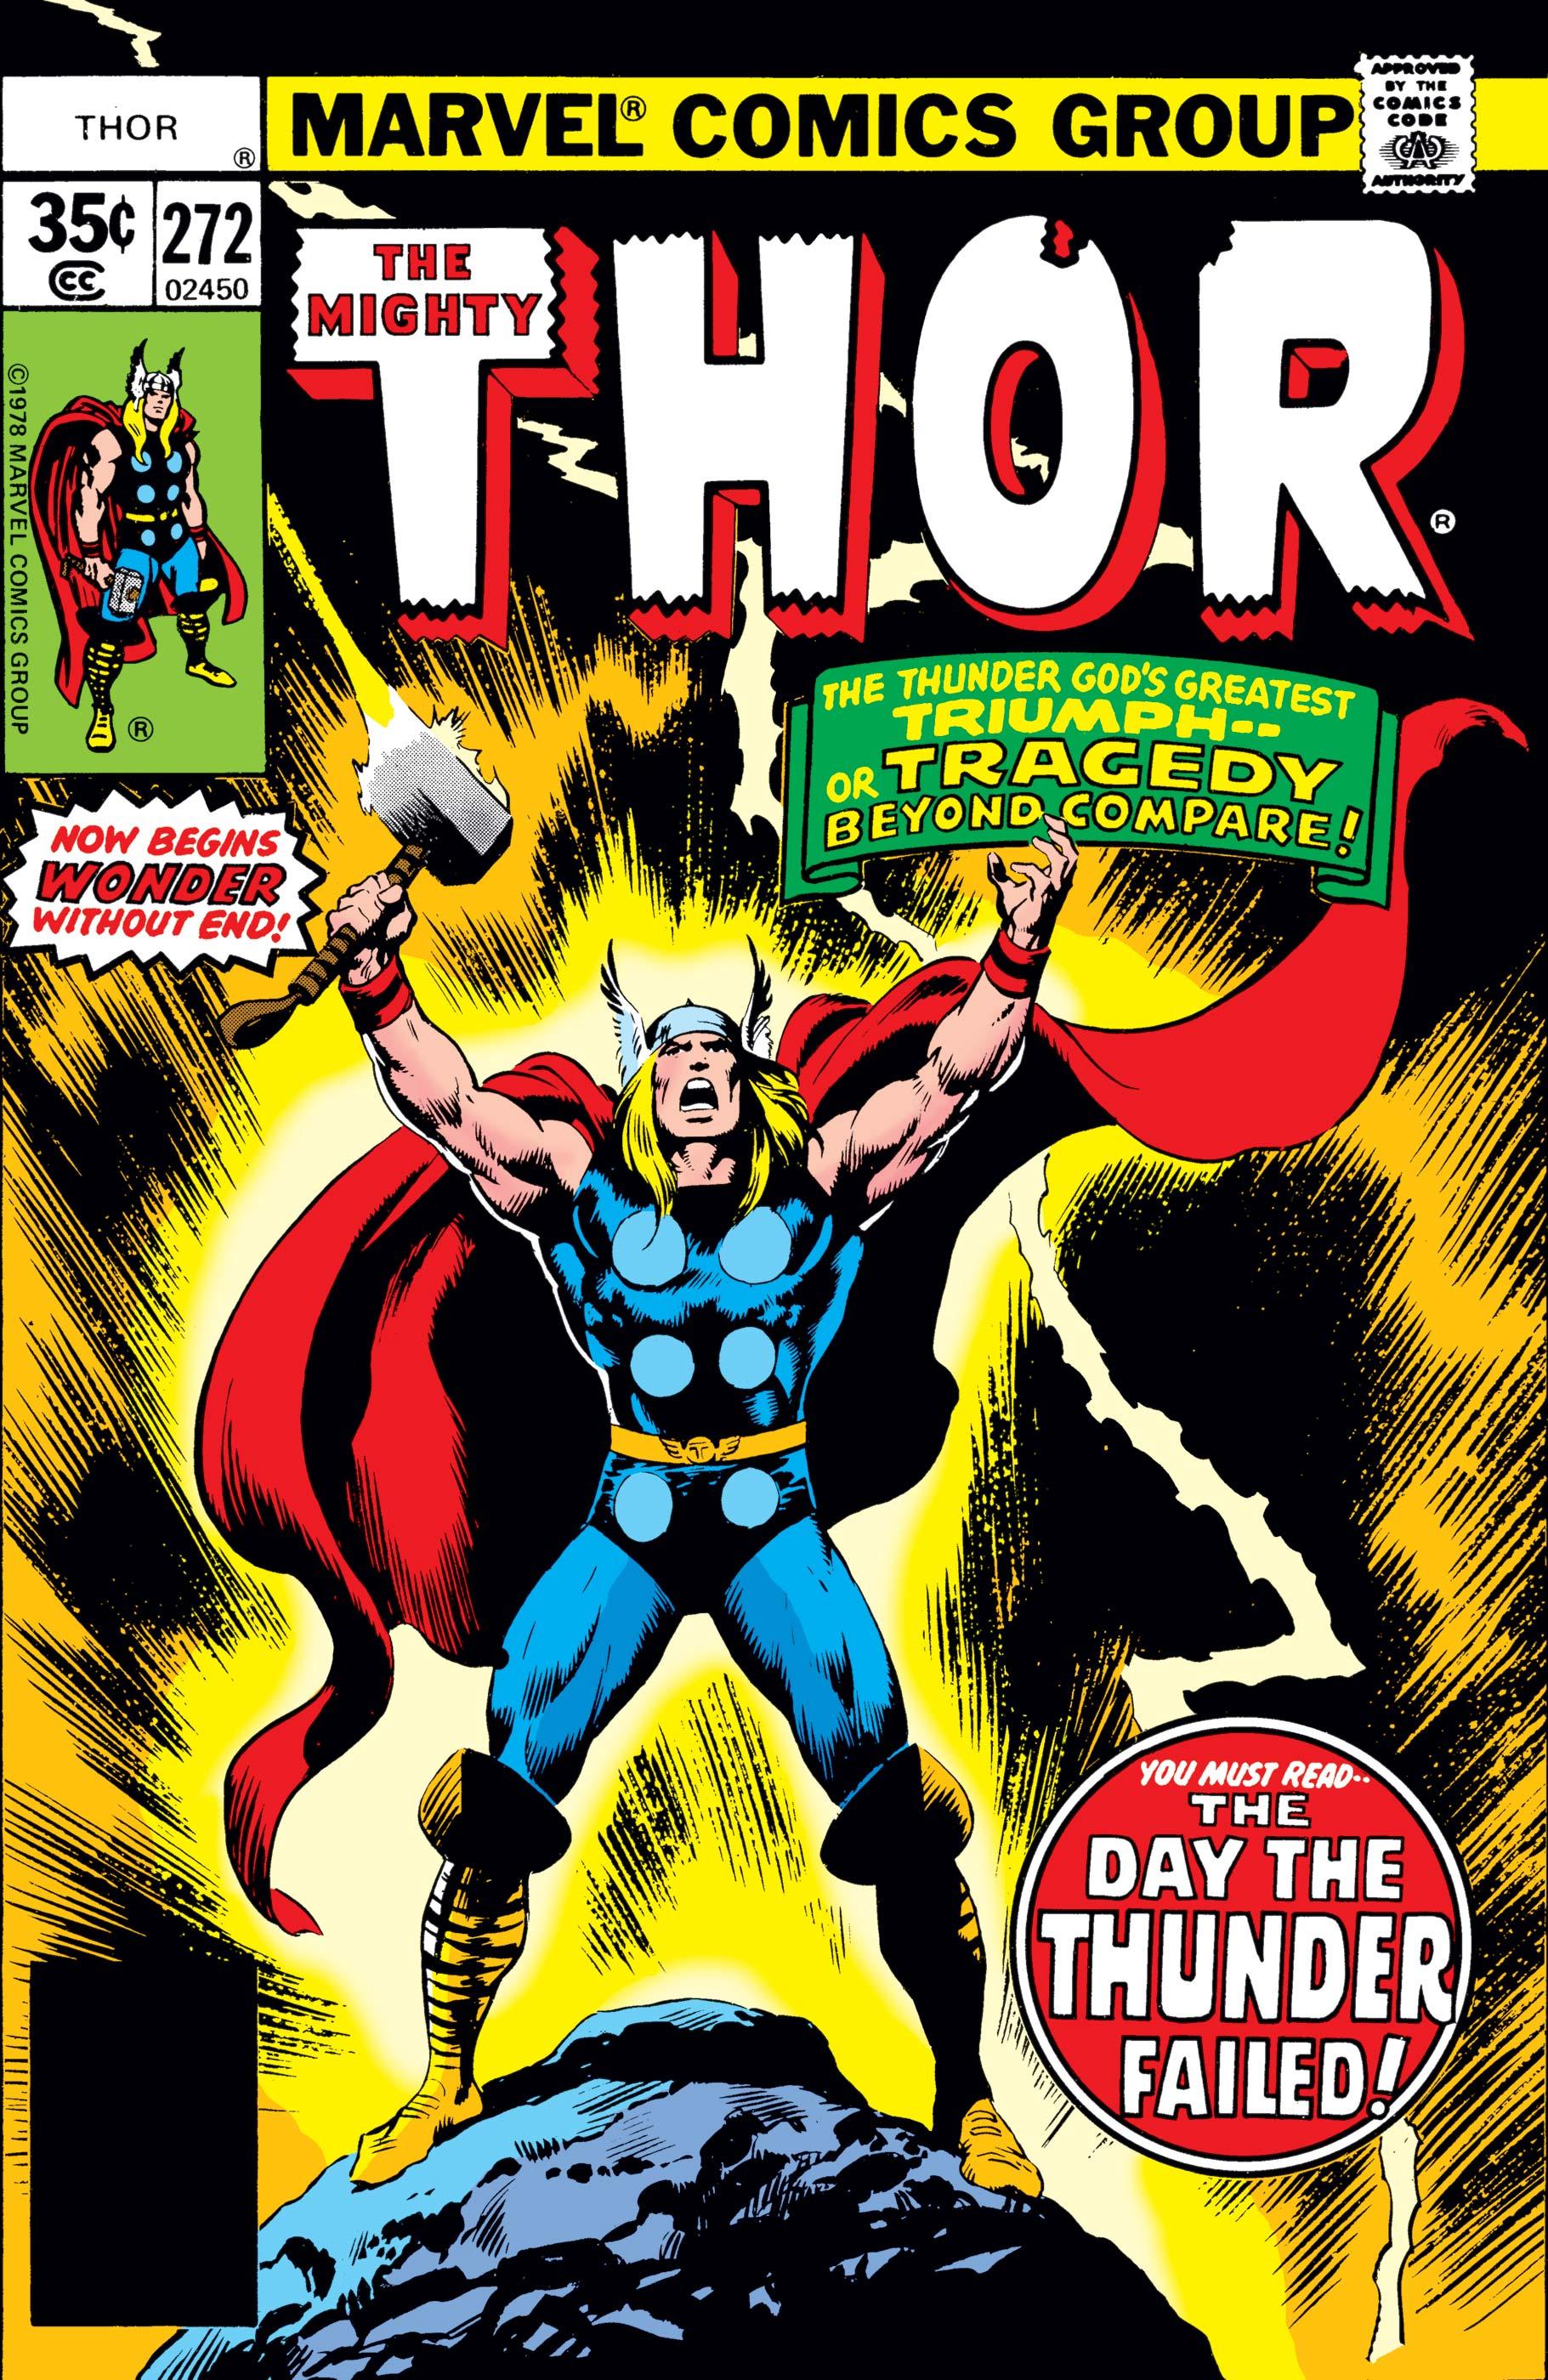 Thor (1966) #272